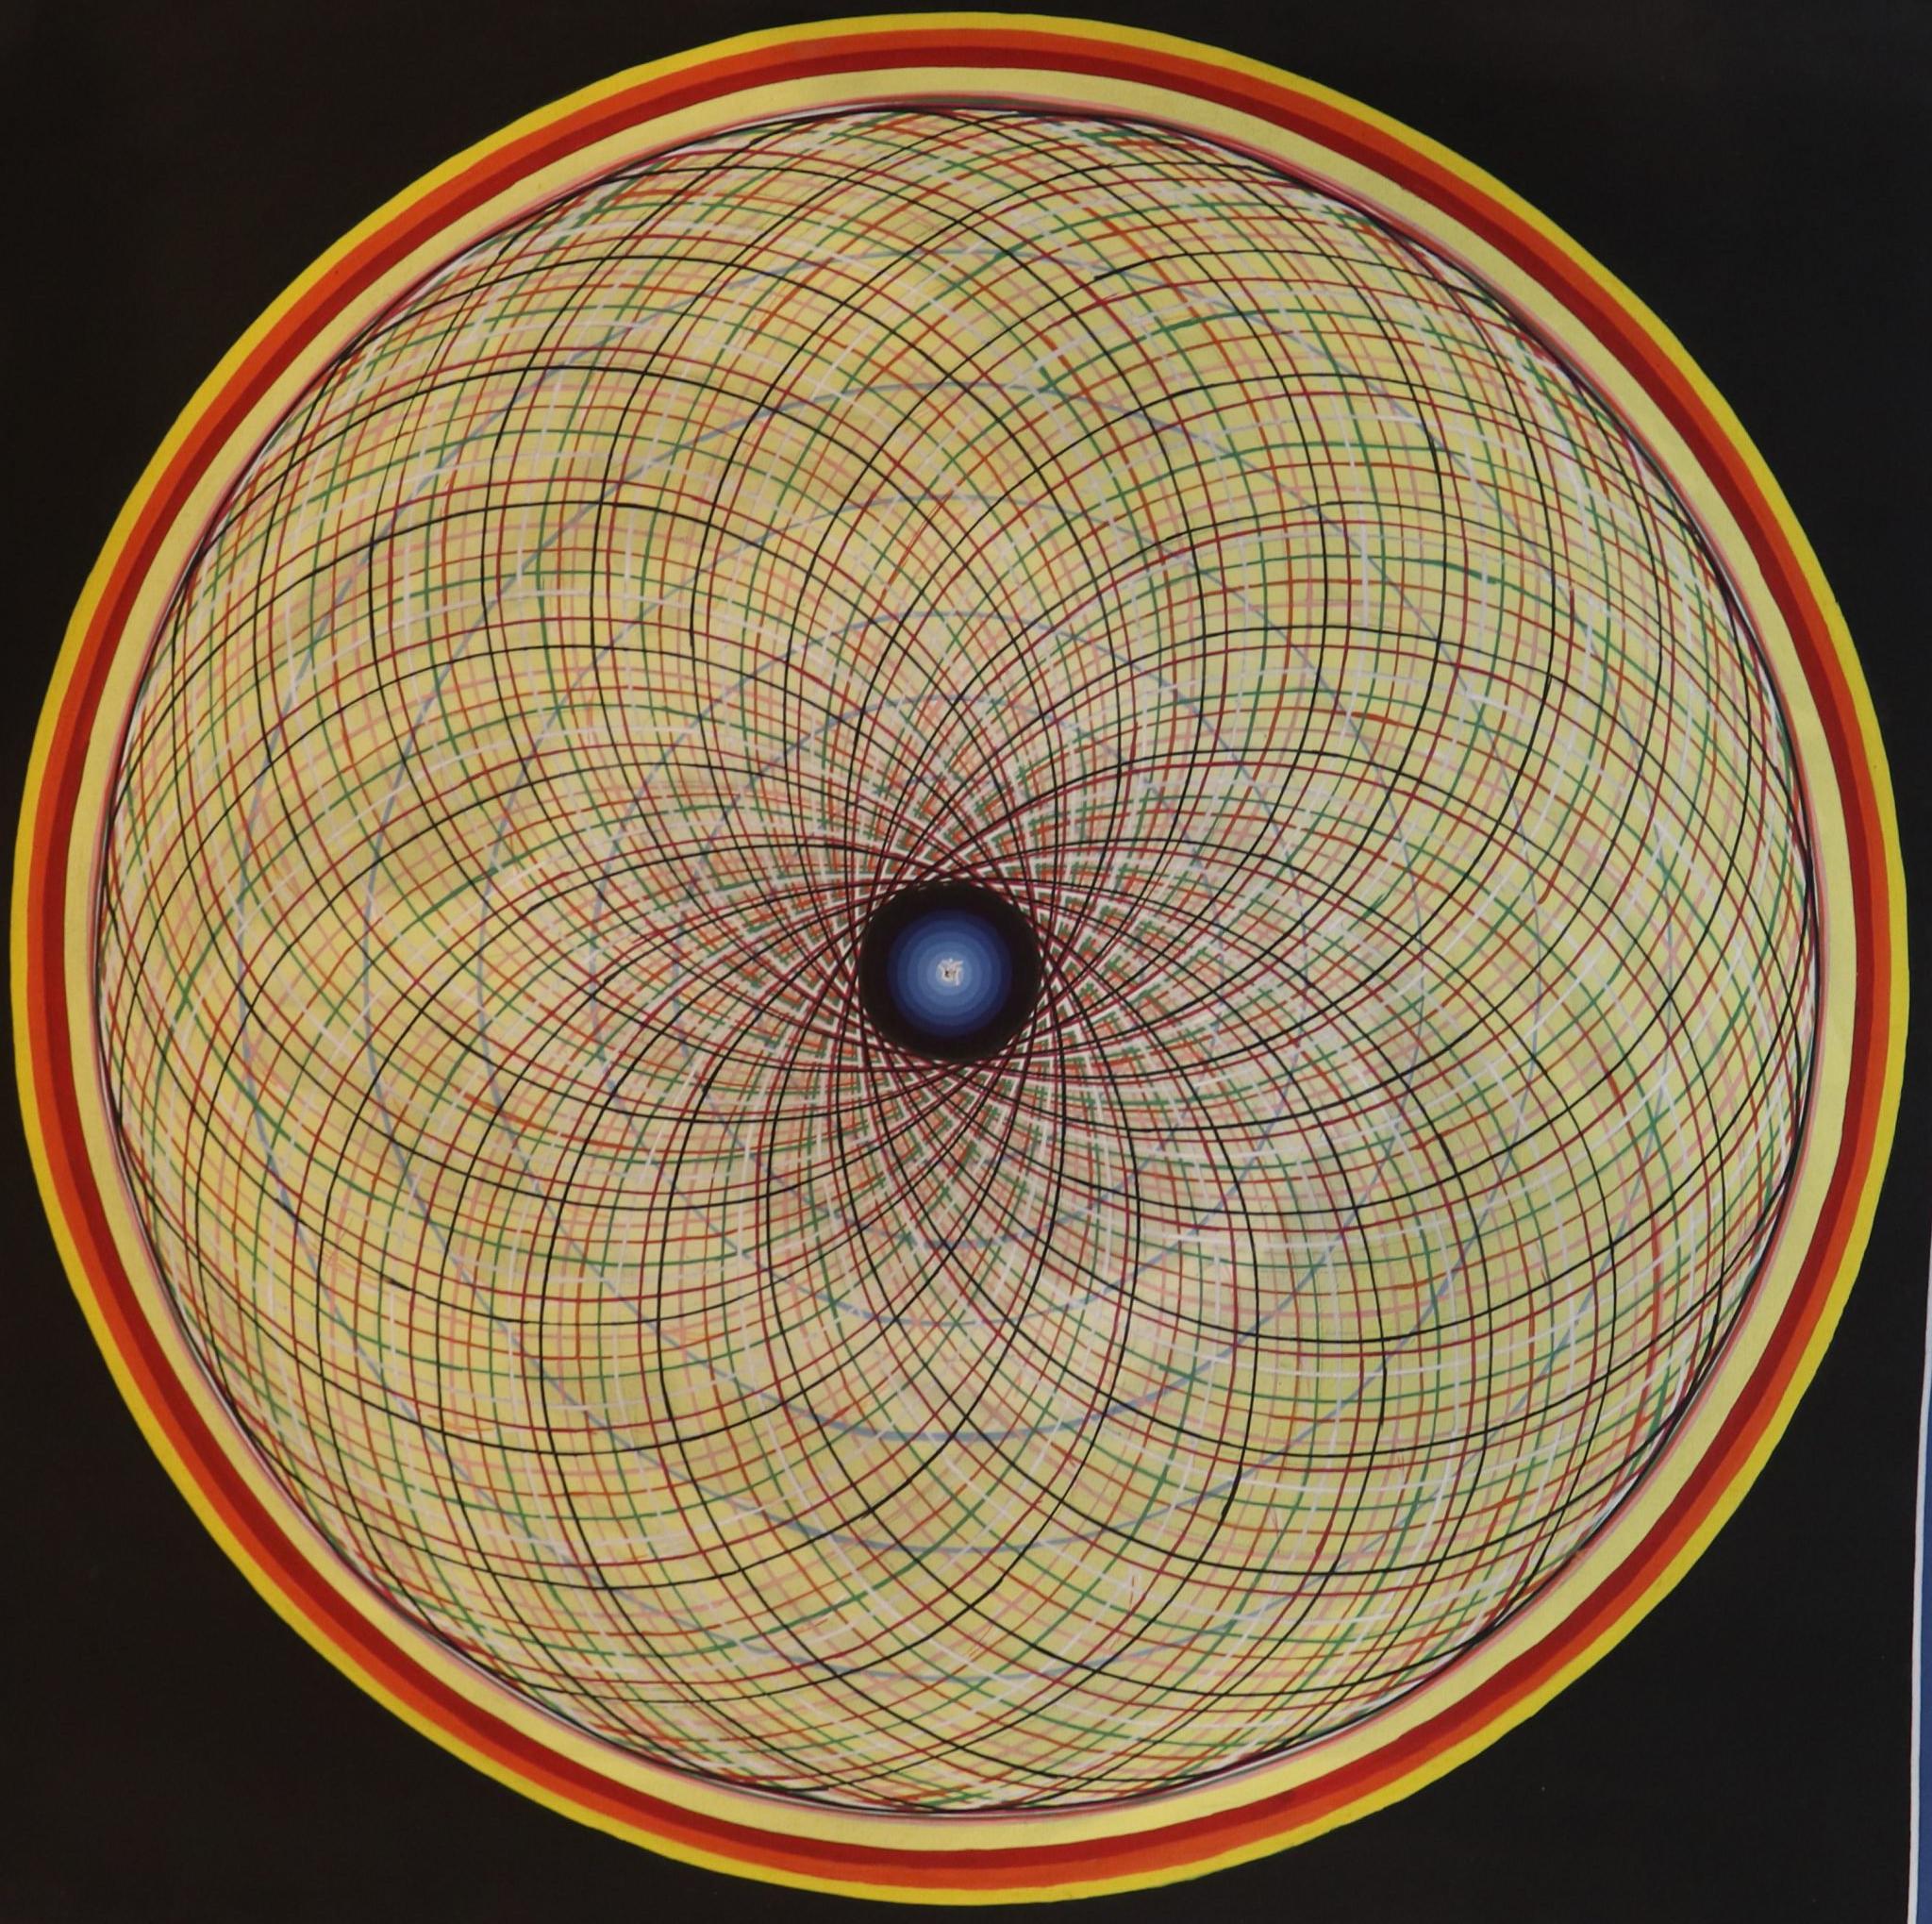 discount sale on wholesale reputable site Cosmic Mandala